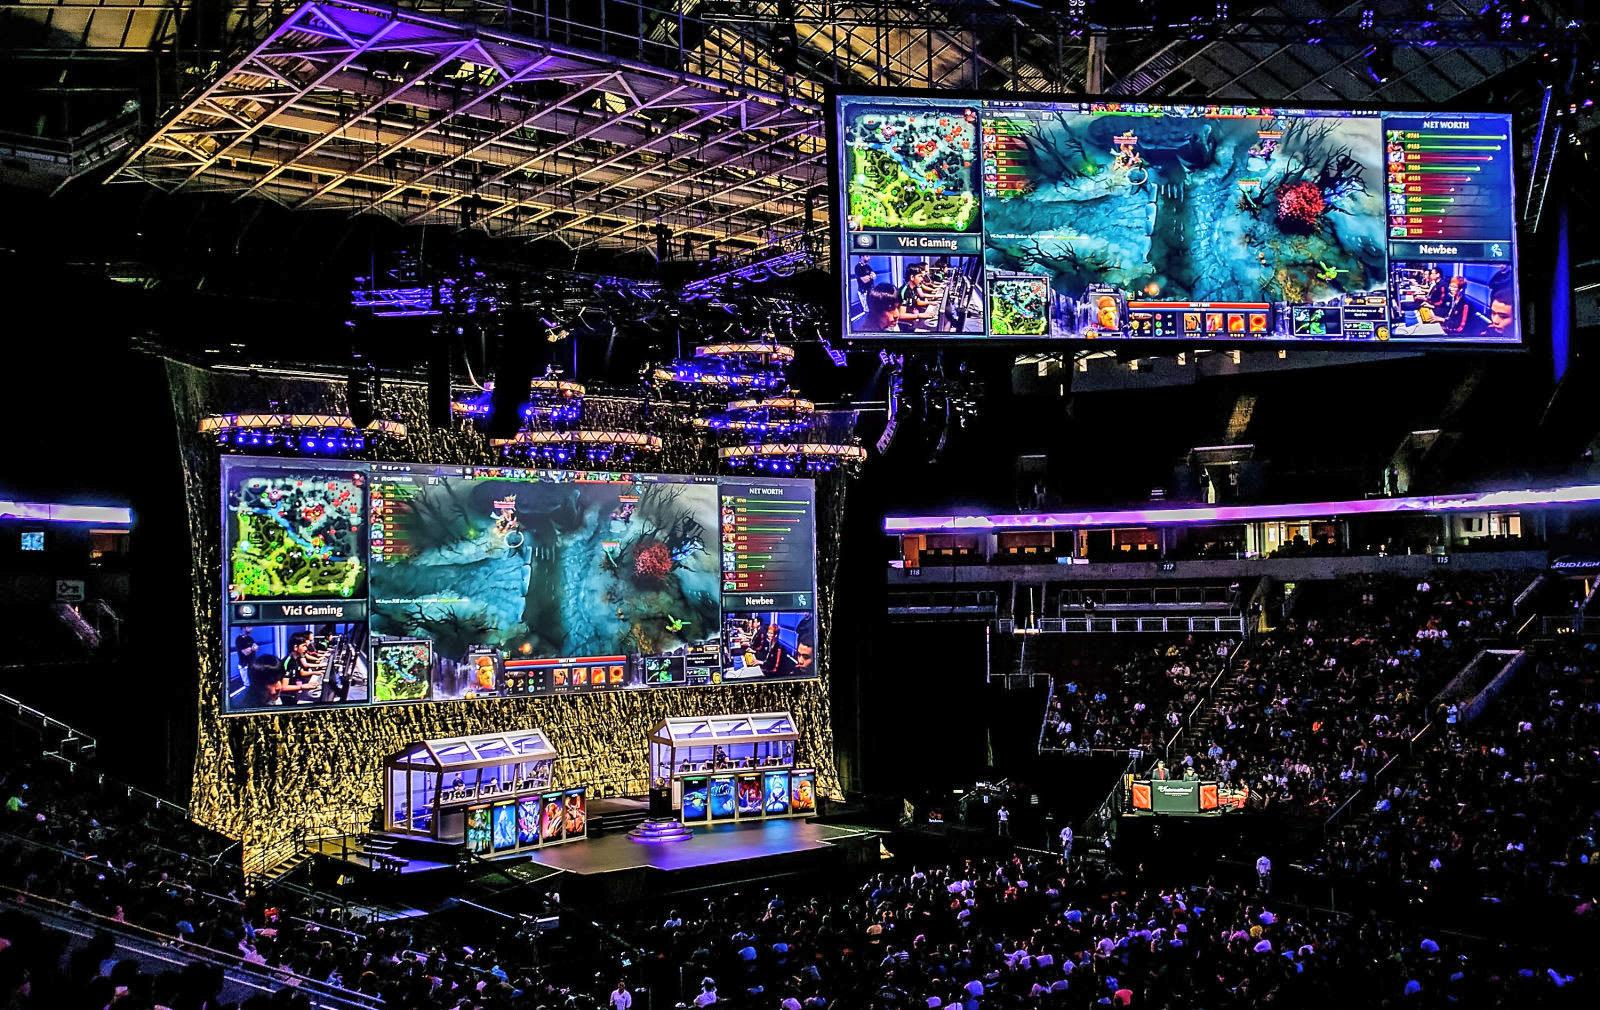 TBS to air four-part docuseries on 'Dota 2' tournament competitors